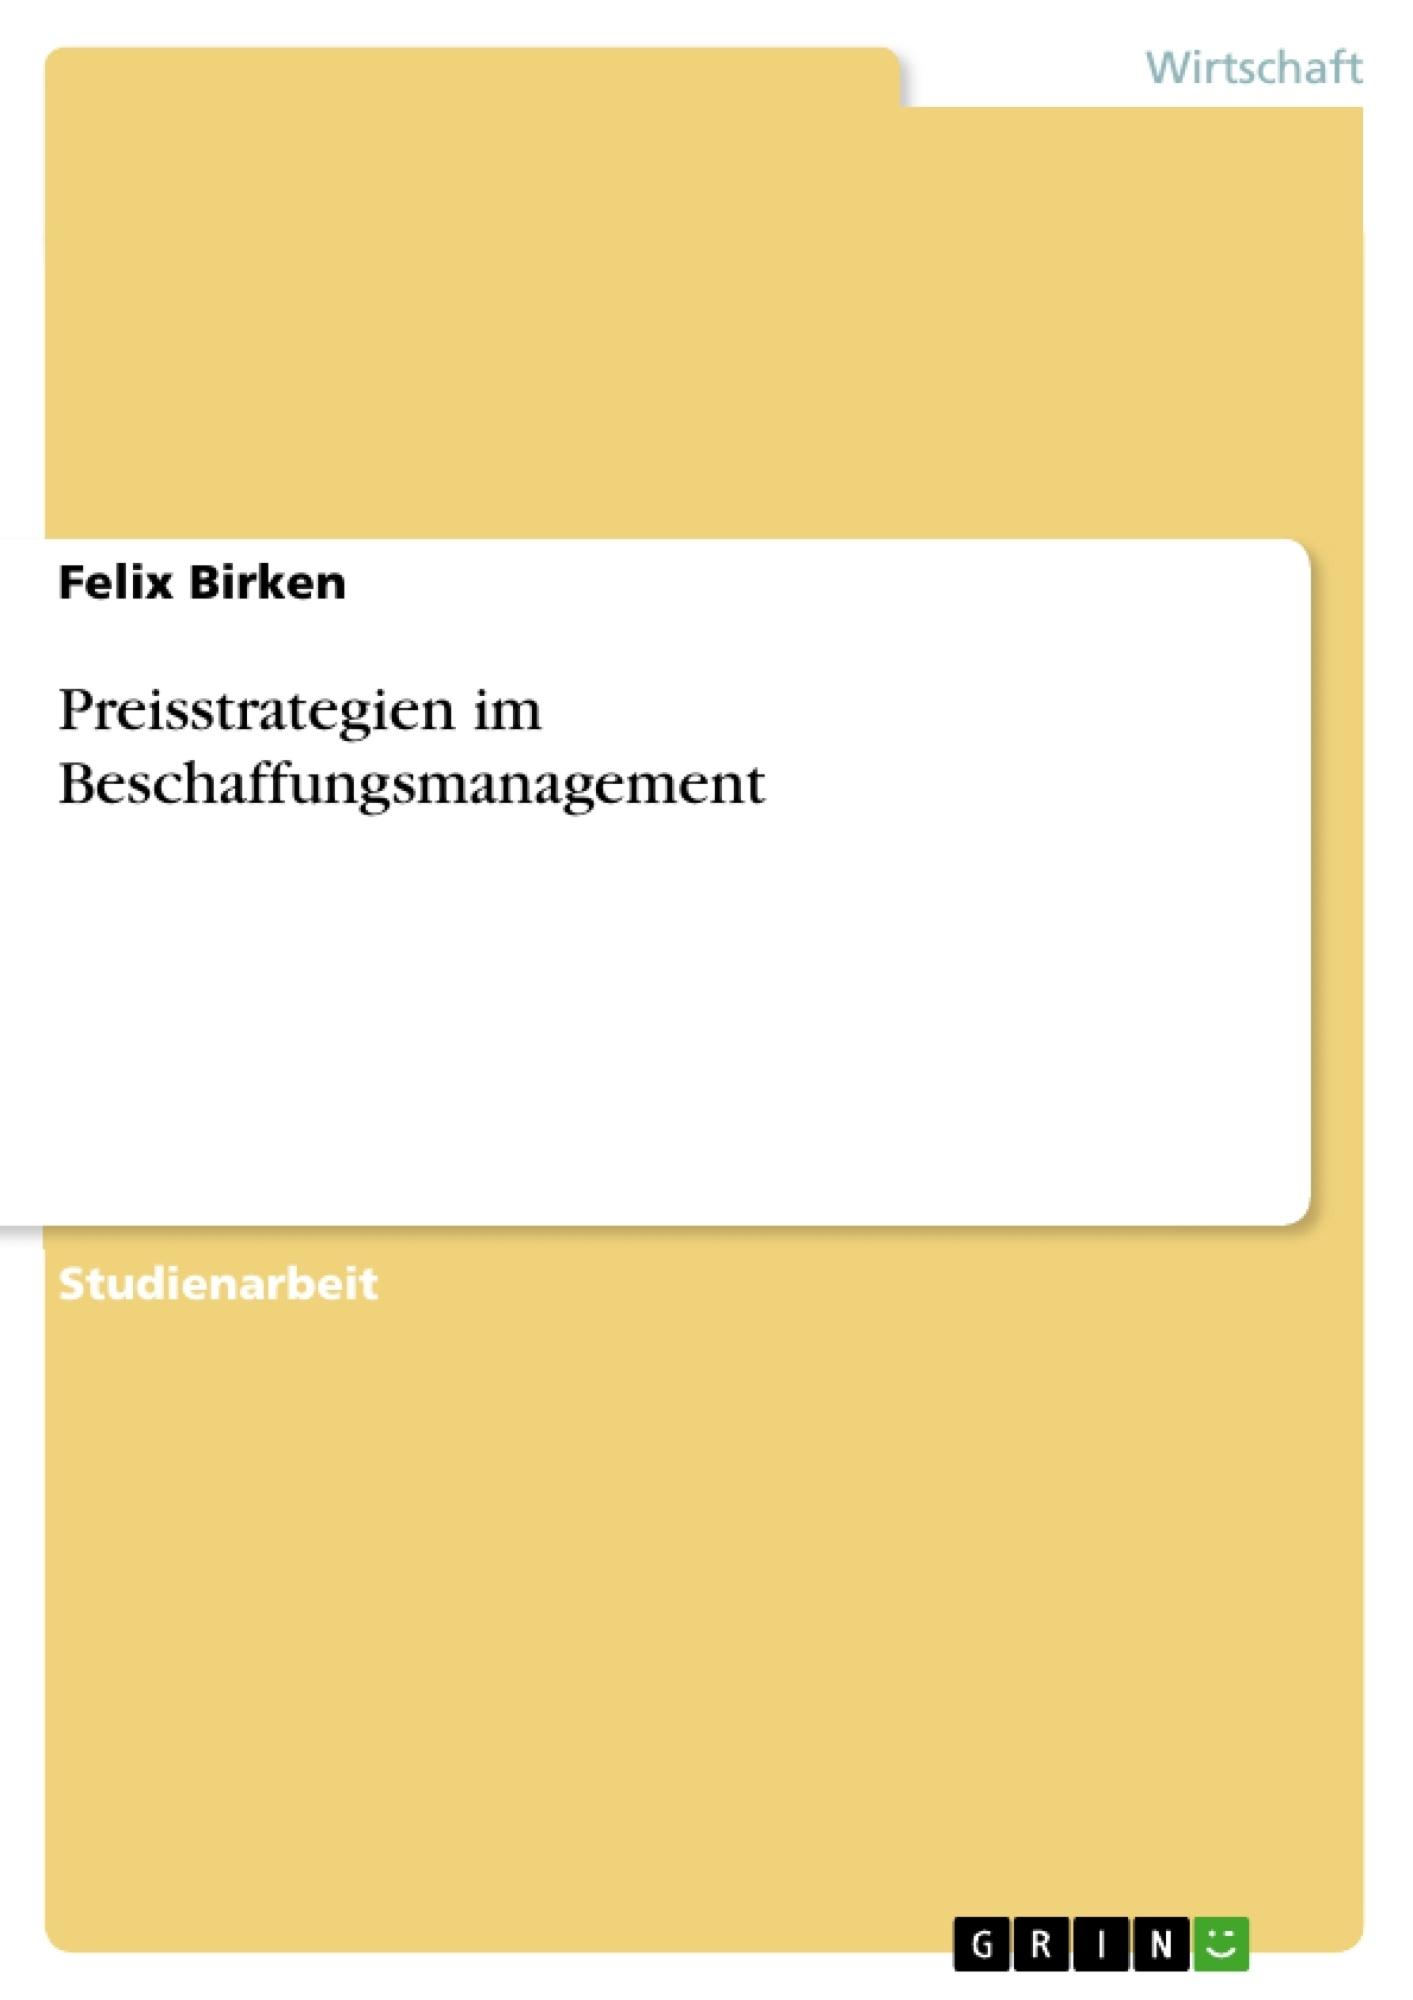 Titel: Preisstrategien im Beschaffungsmanagement